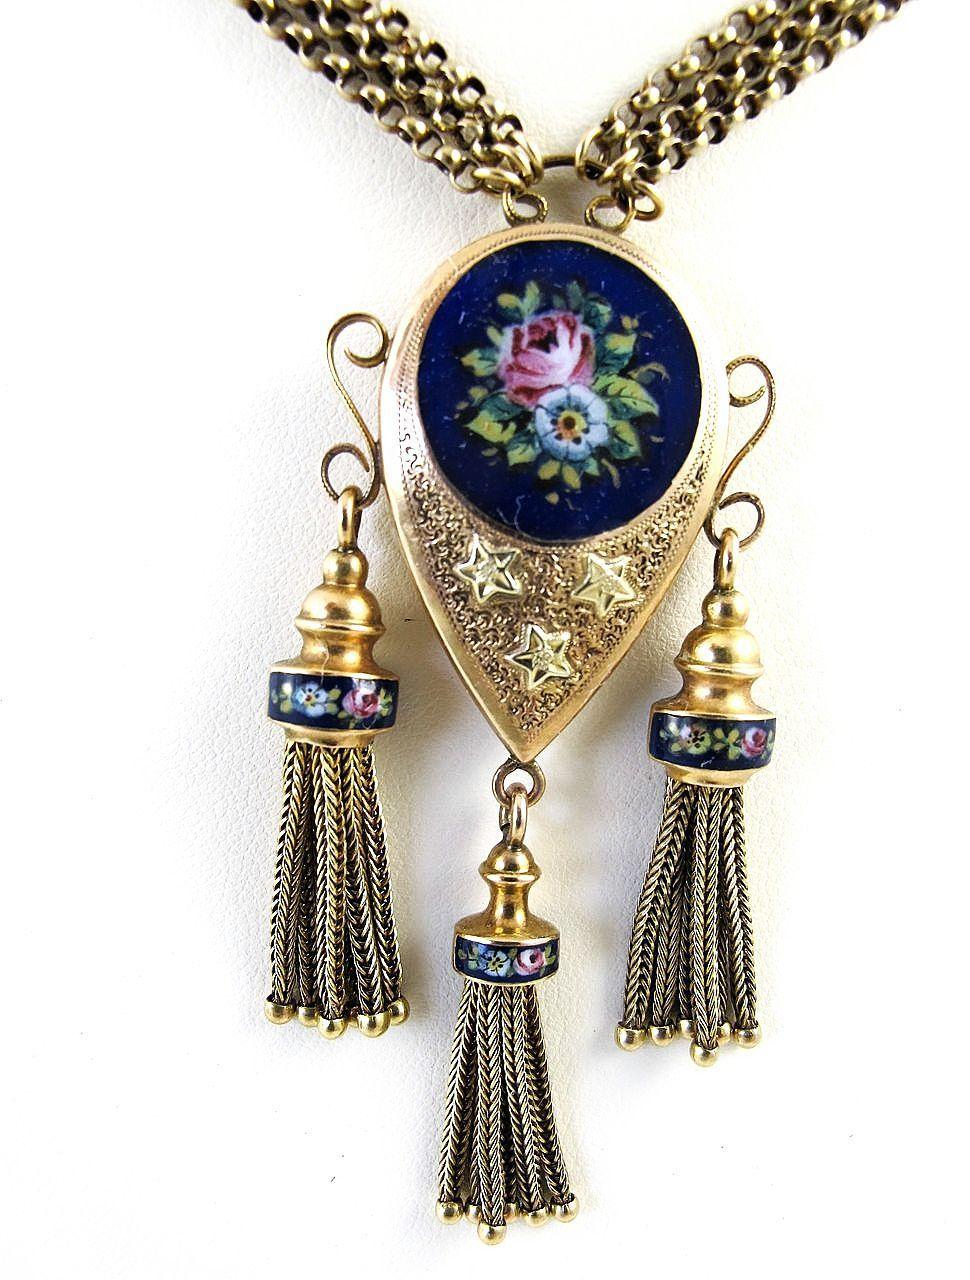 Magnificent Circa 1900 Antique Enameled 14K Necklace